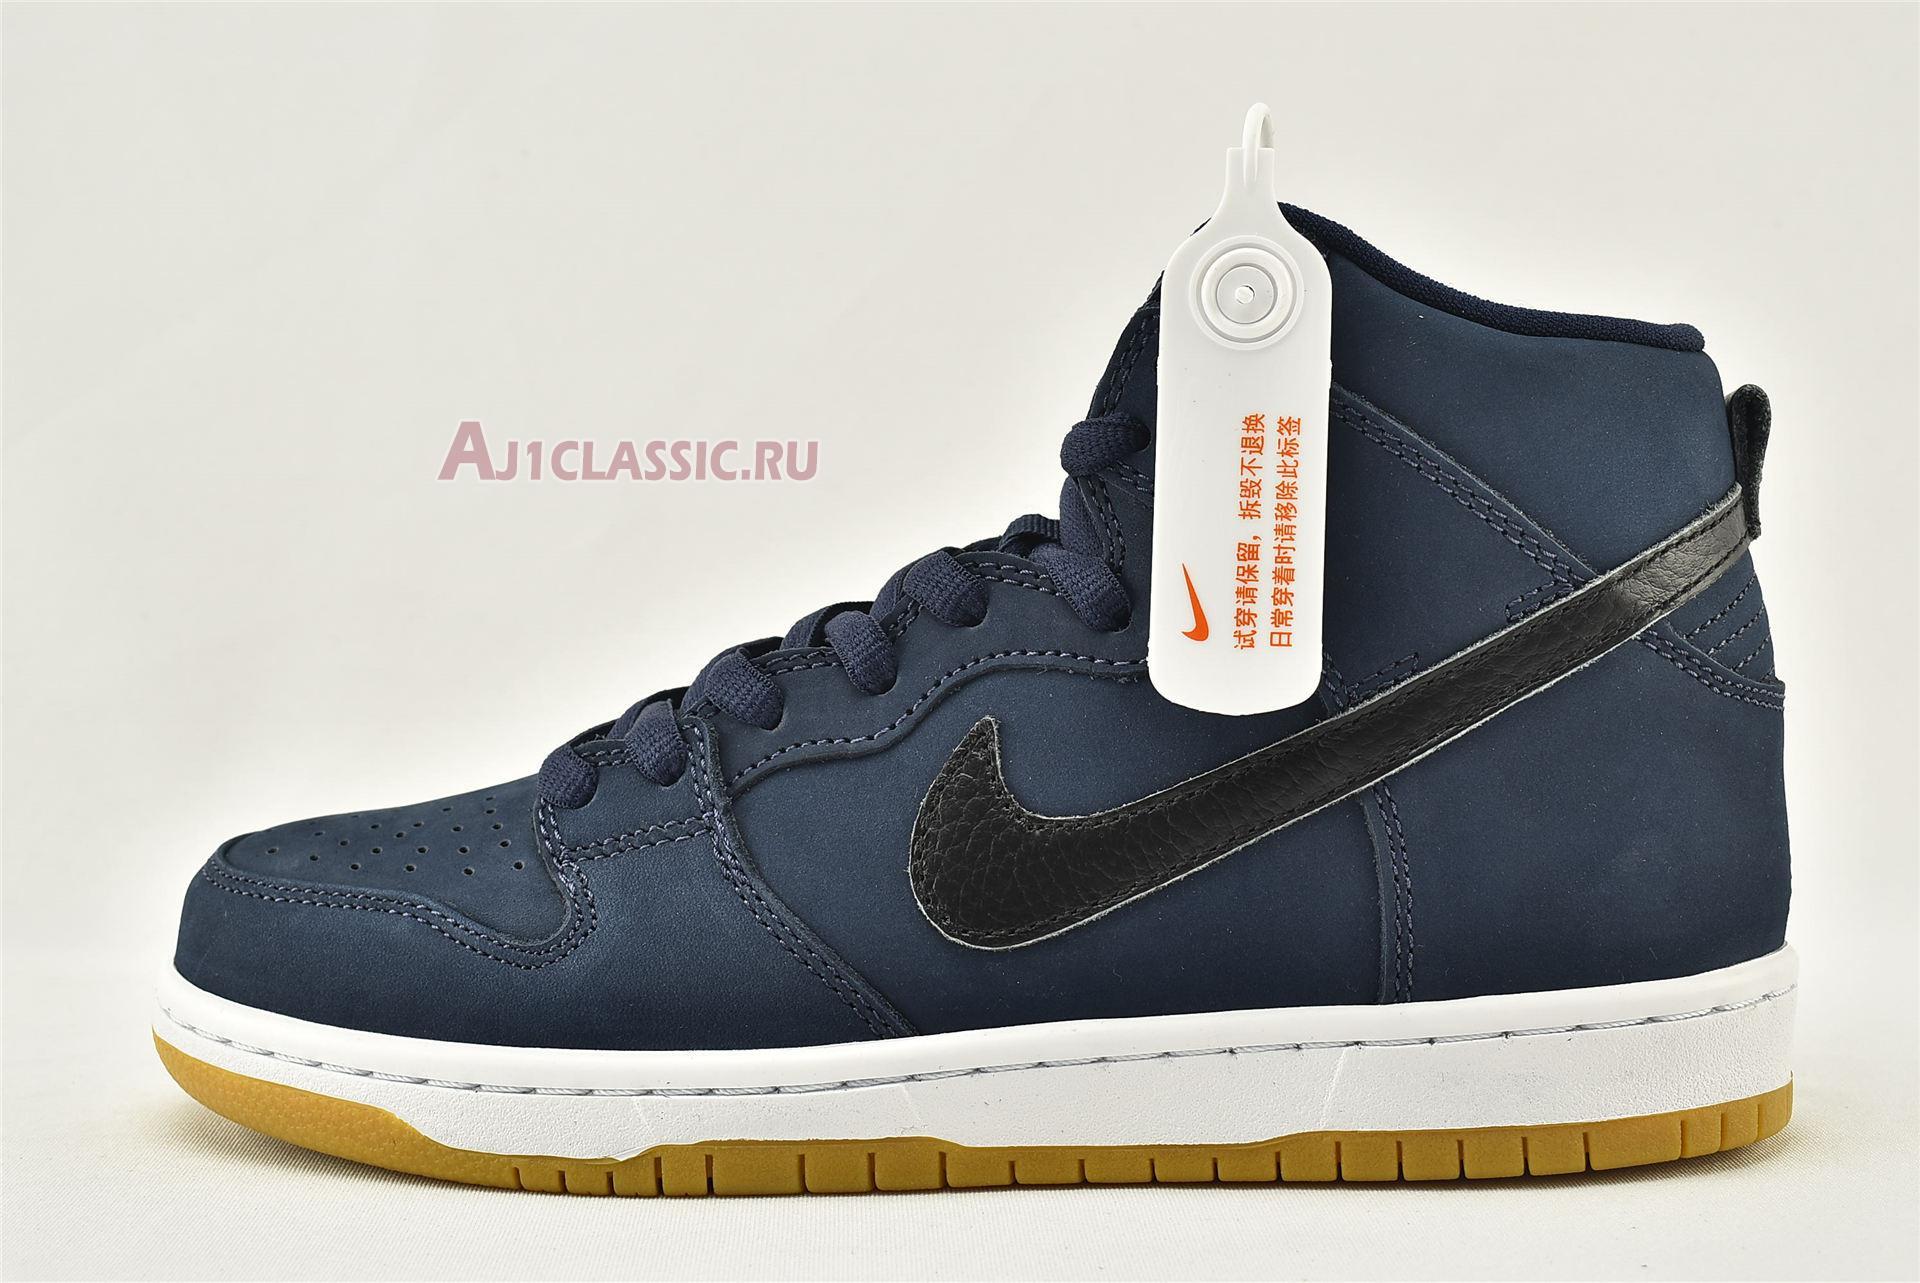 "Nike Dunk High Pro ISO SB ""Orange Label - Midnight Navy"" CI2692-401"